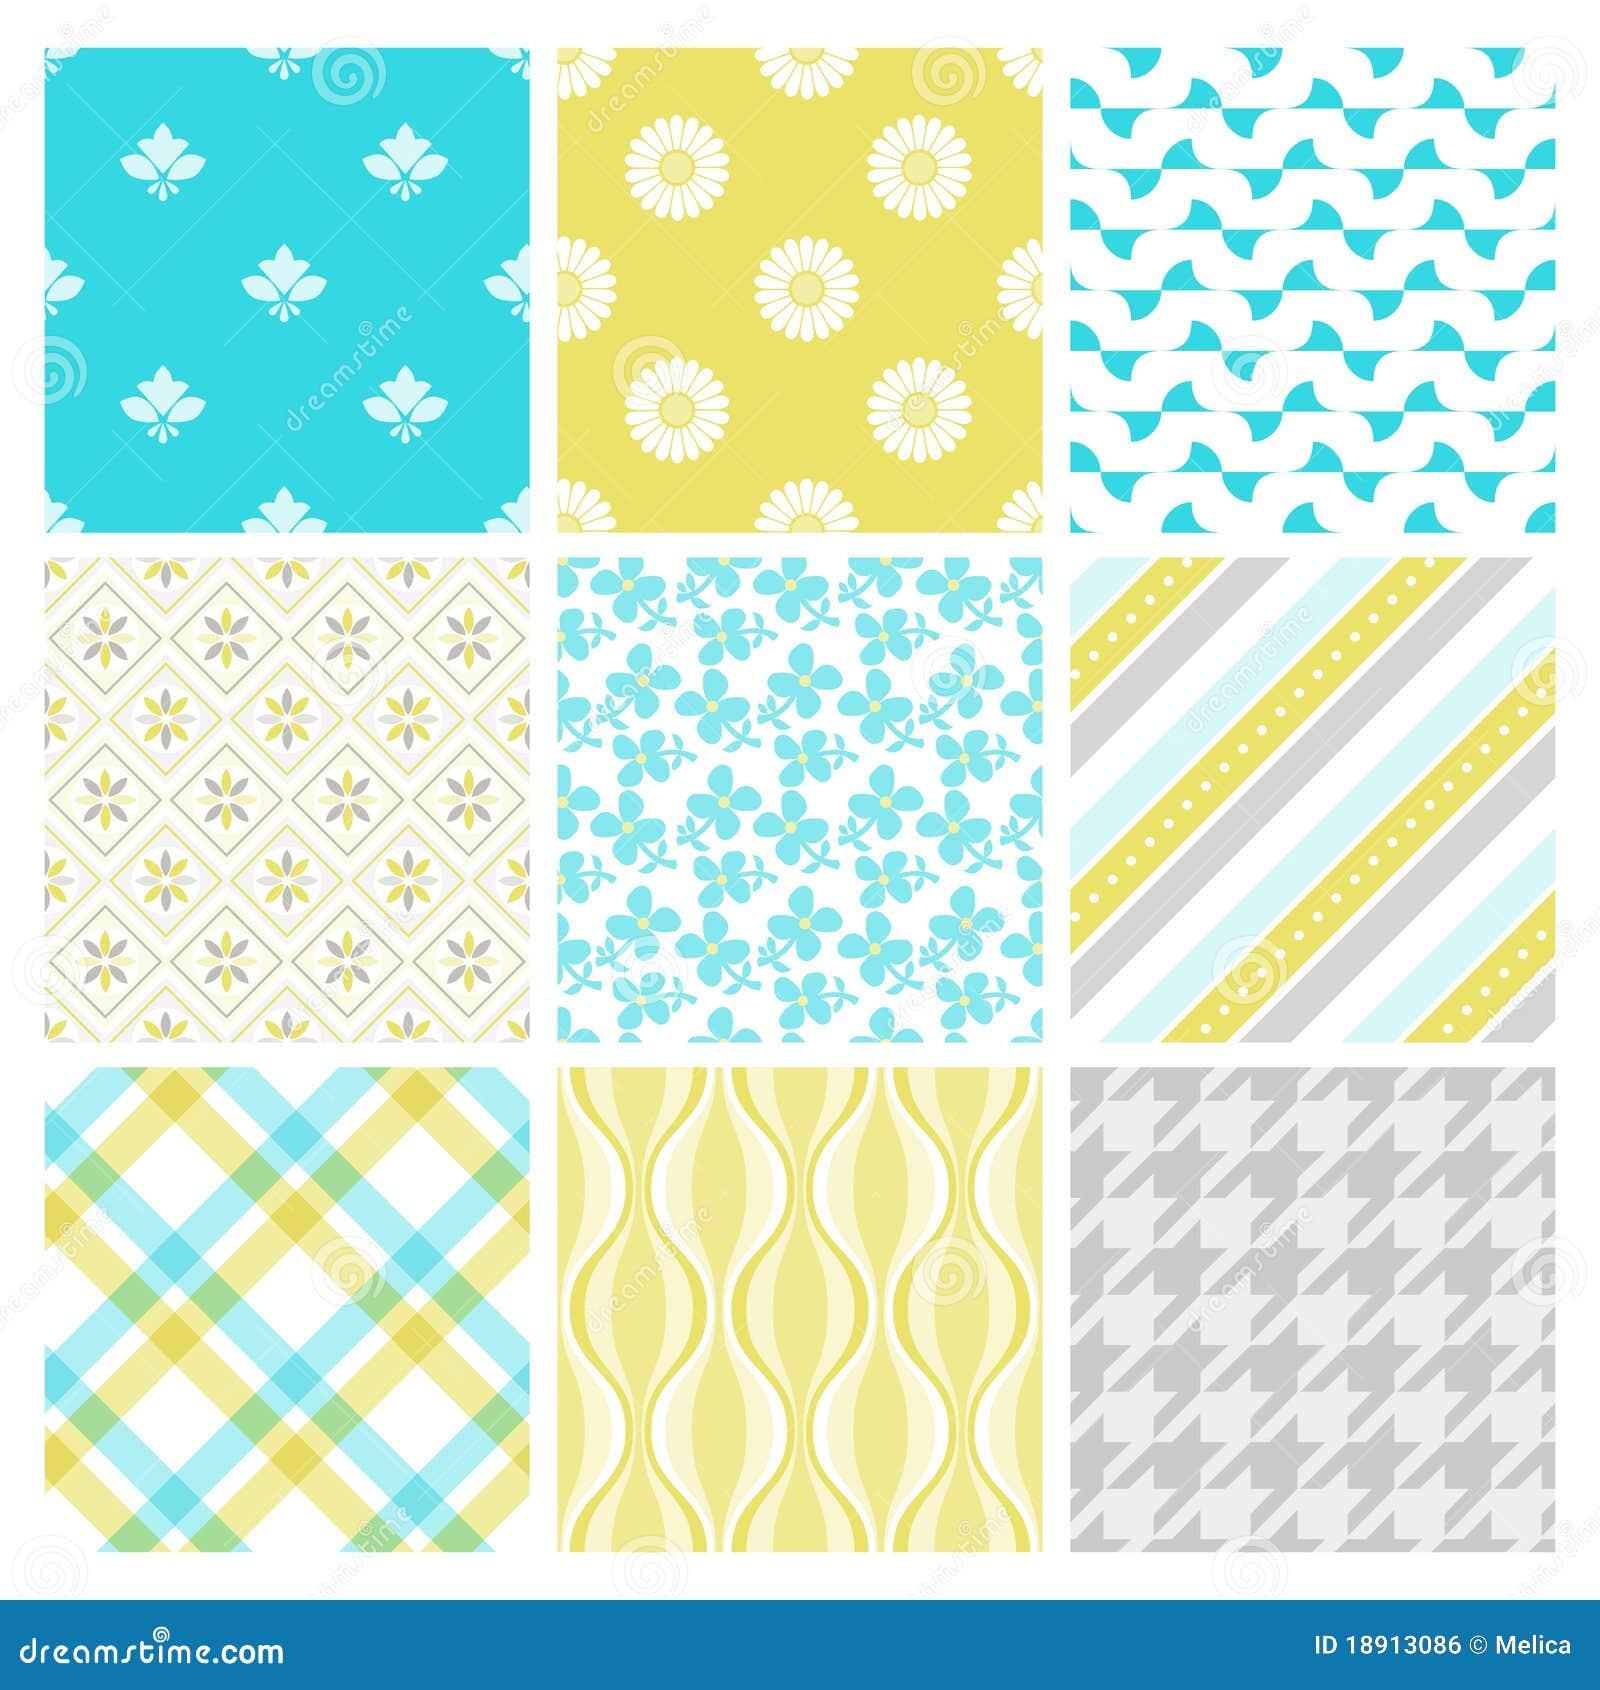 Nine trendy textile or wallpaper pattern